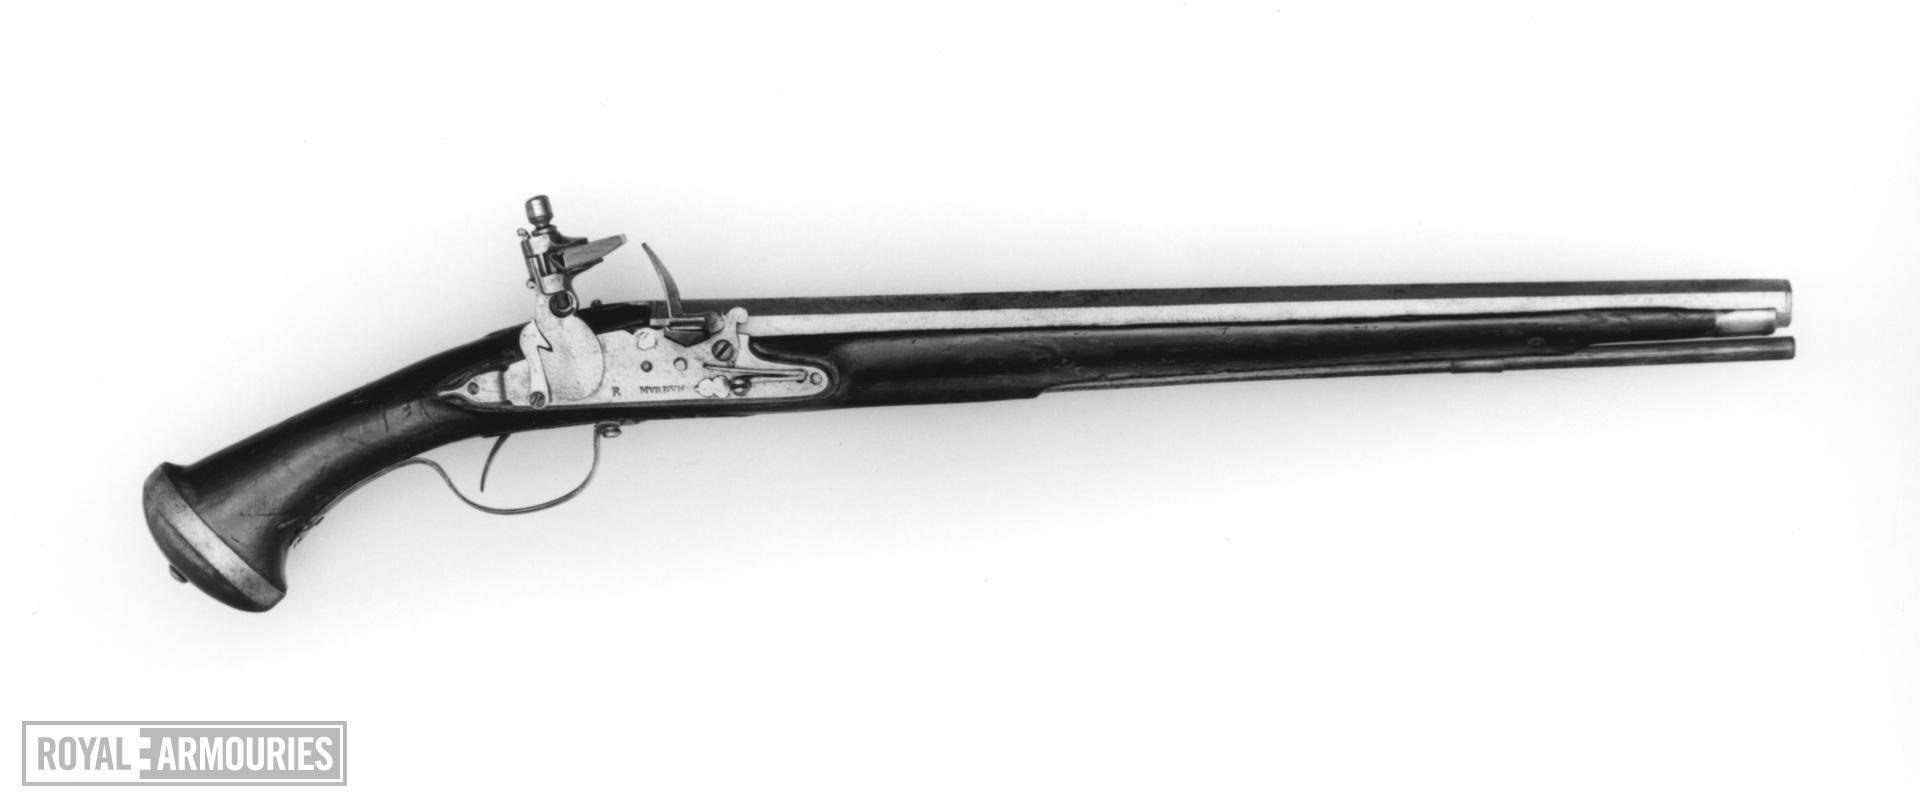 Flintlock pistol By Murden; part of the Littlecote collection